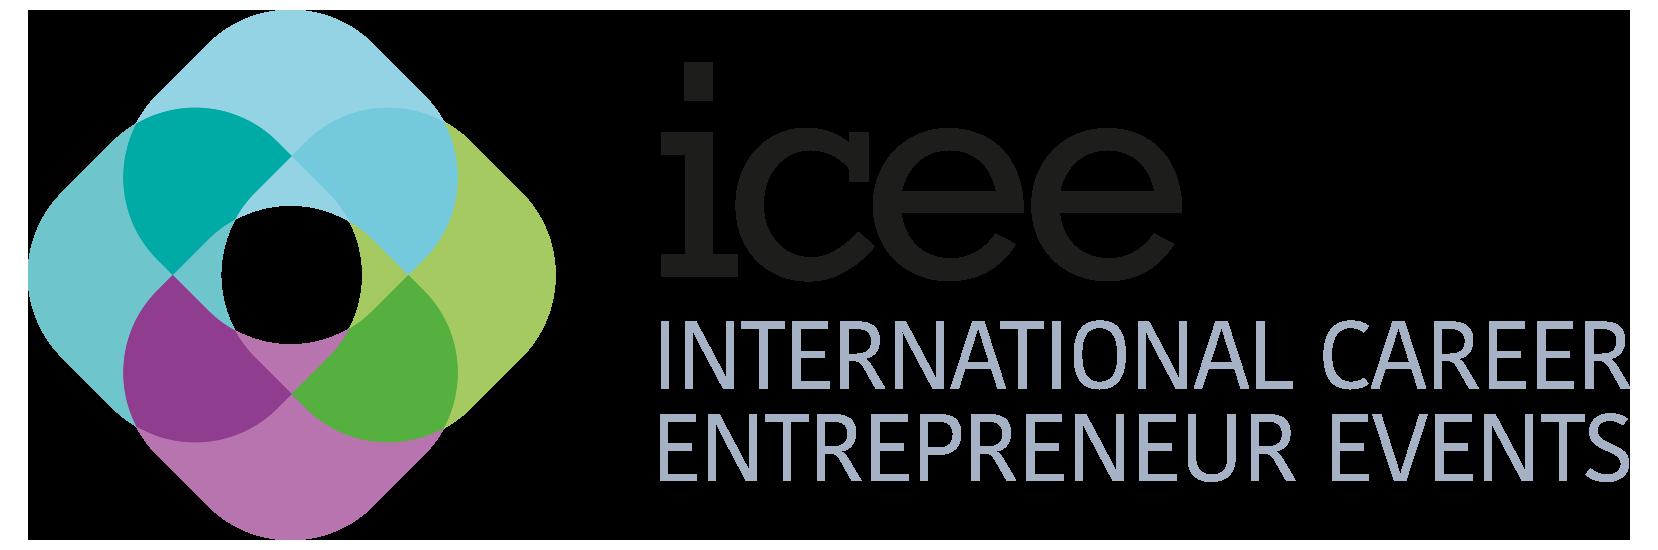 International Career & Entrepreneur Events Ltd (ICEE Ltd)